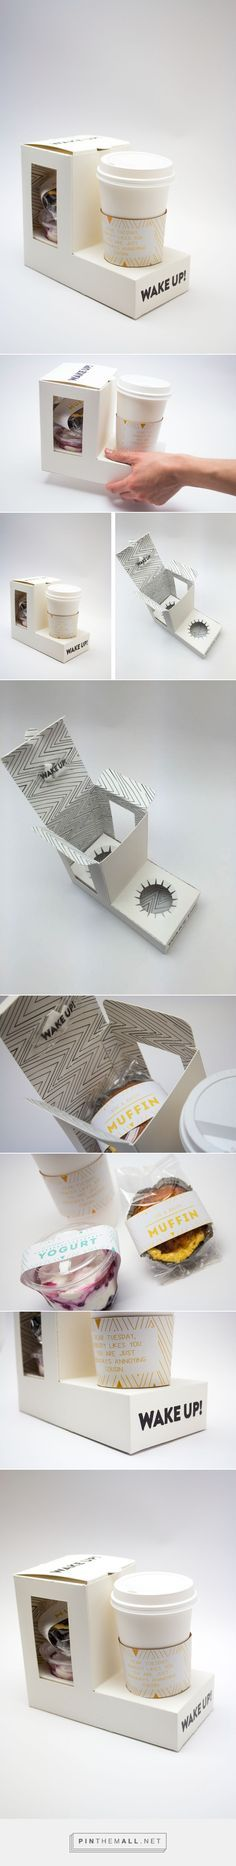 Idea de packaging en cajas para una empresa de café. Si estás interesado. https://www.cajadecarton.es/contactar?utm_source=Pinterest&utm_medium=social&utm_campaign=20160617-cajadecarton_contactar